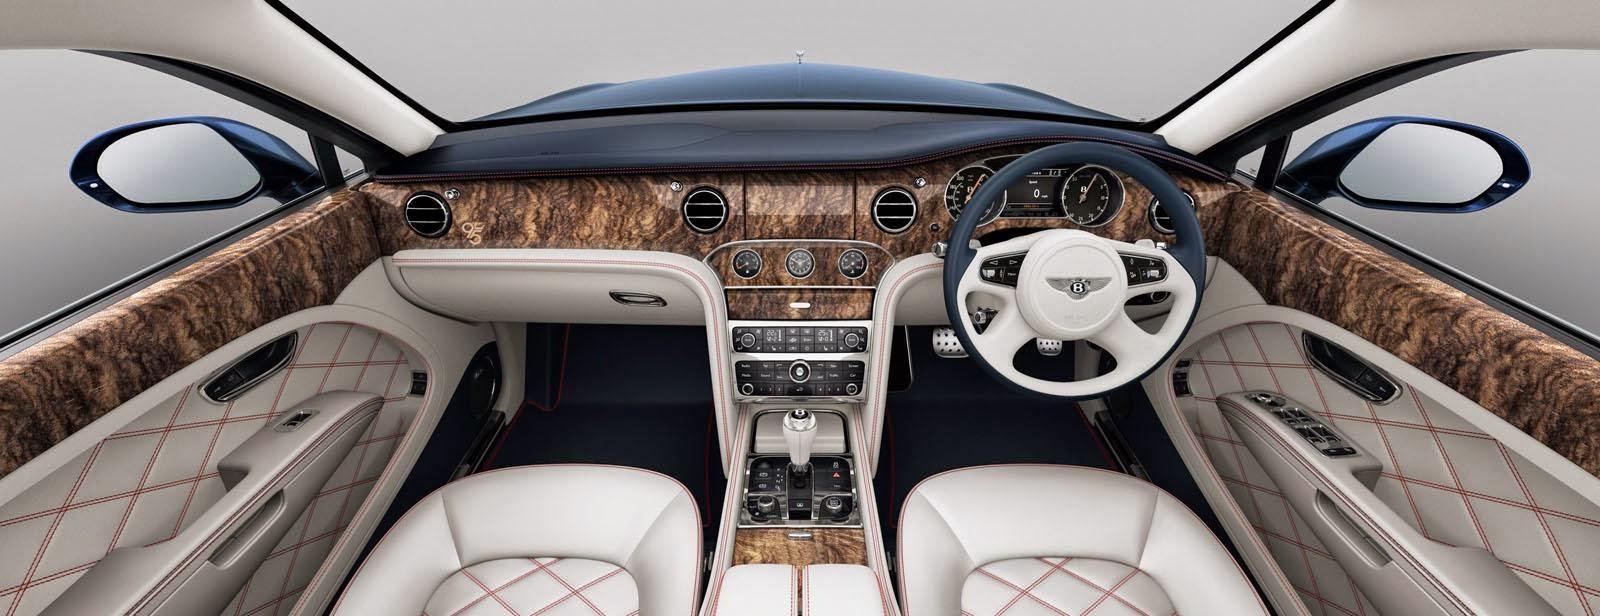 [Resim: Bentley+Mulsanne+95+Edition+2.jpg]